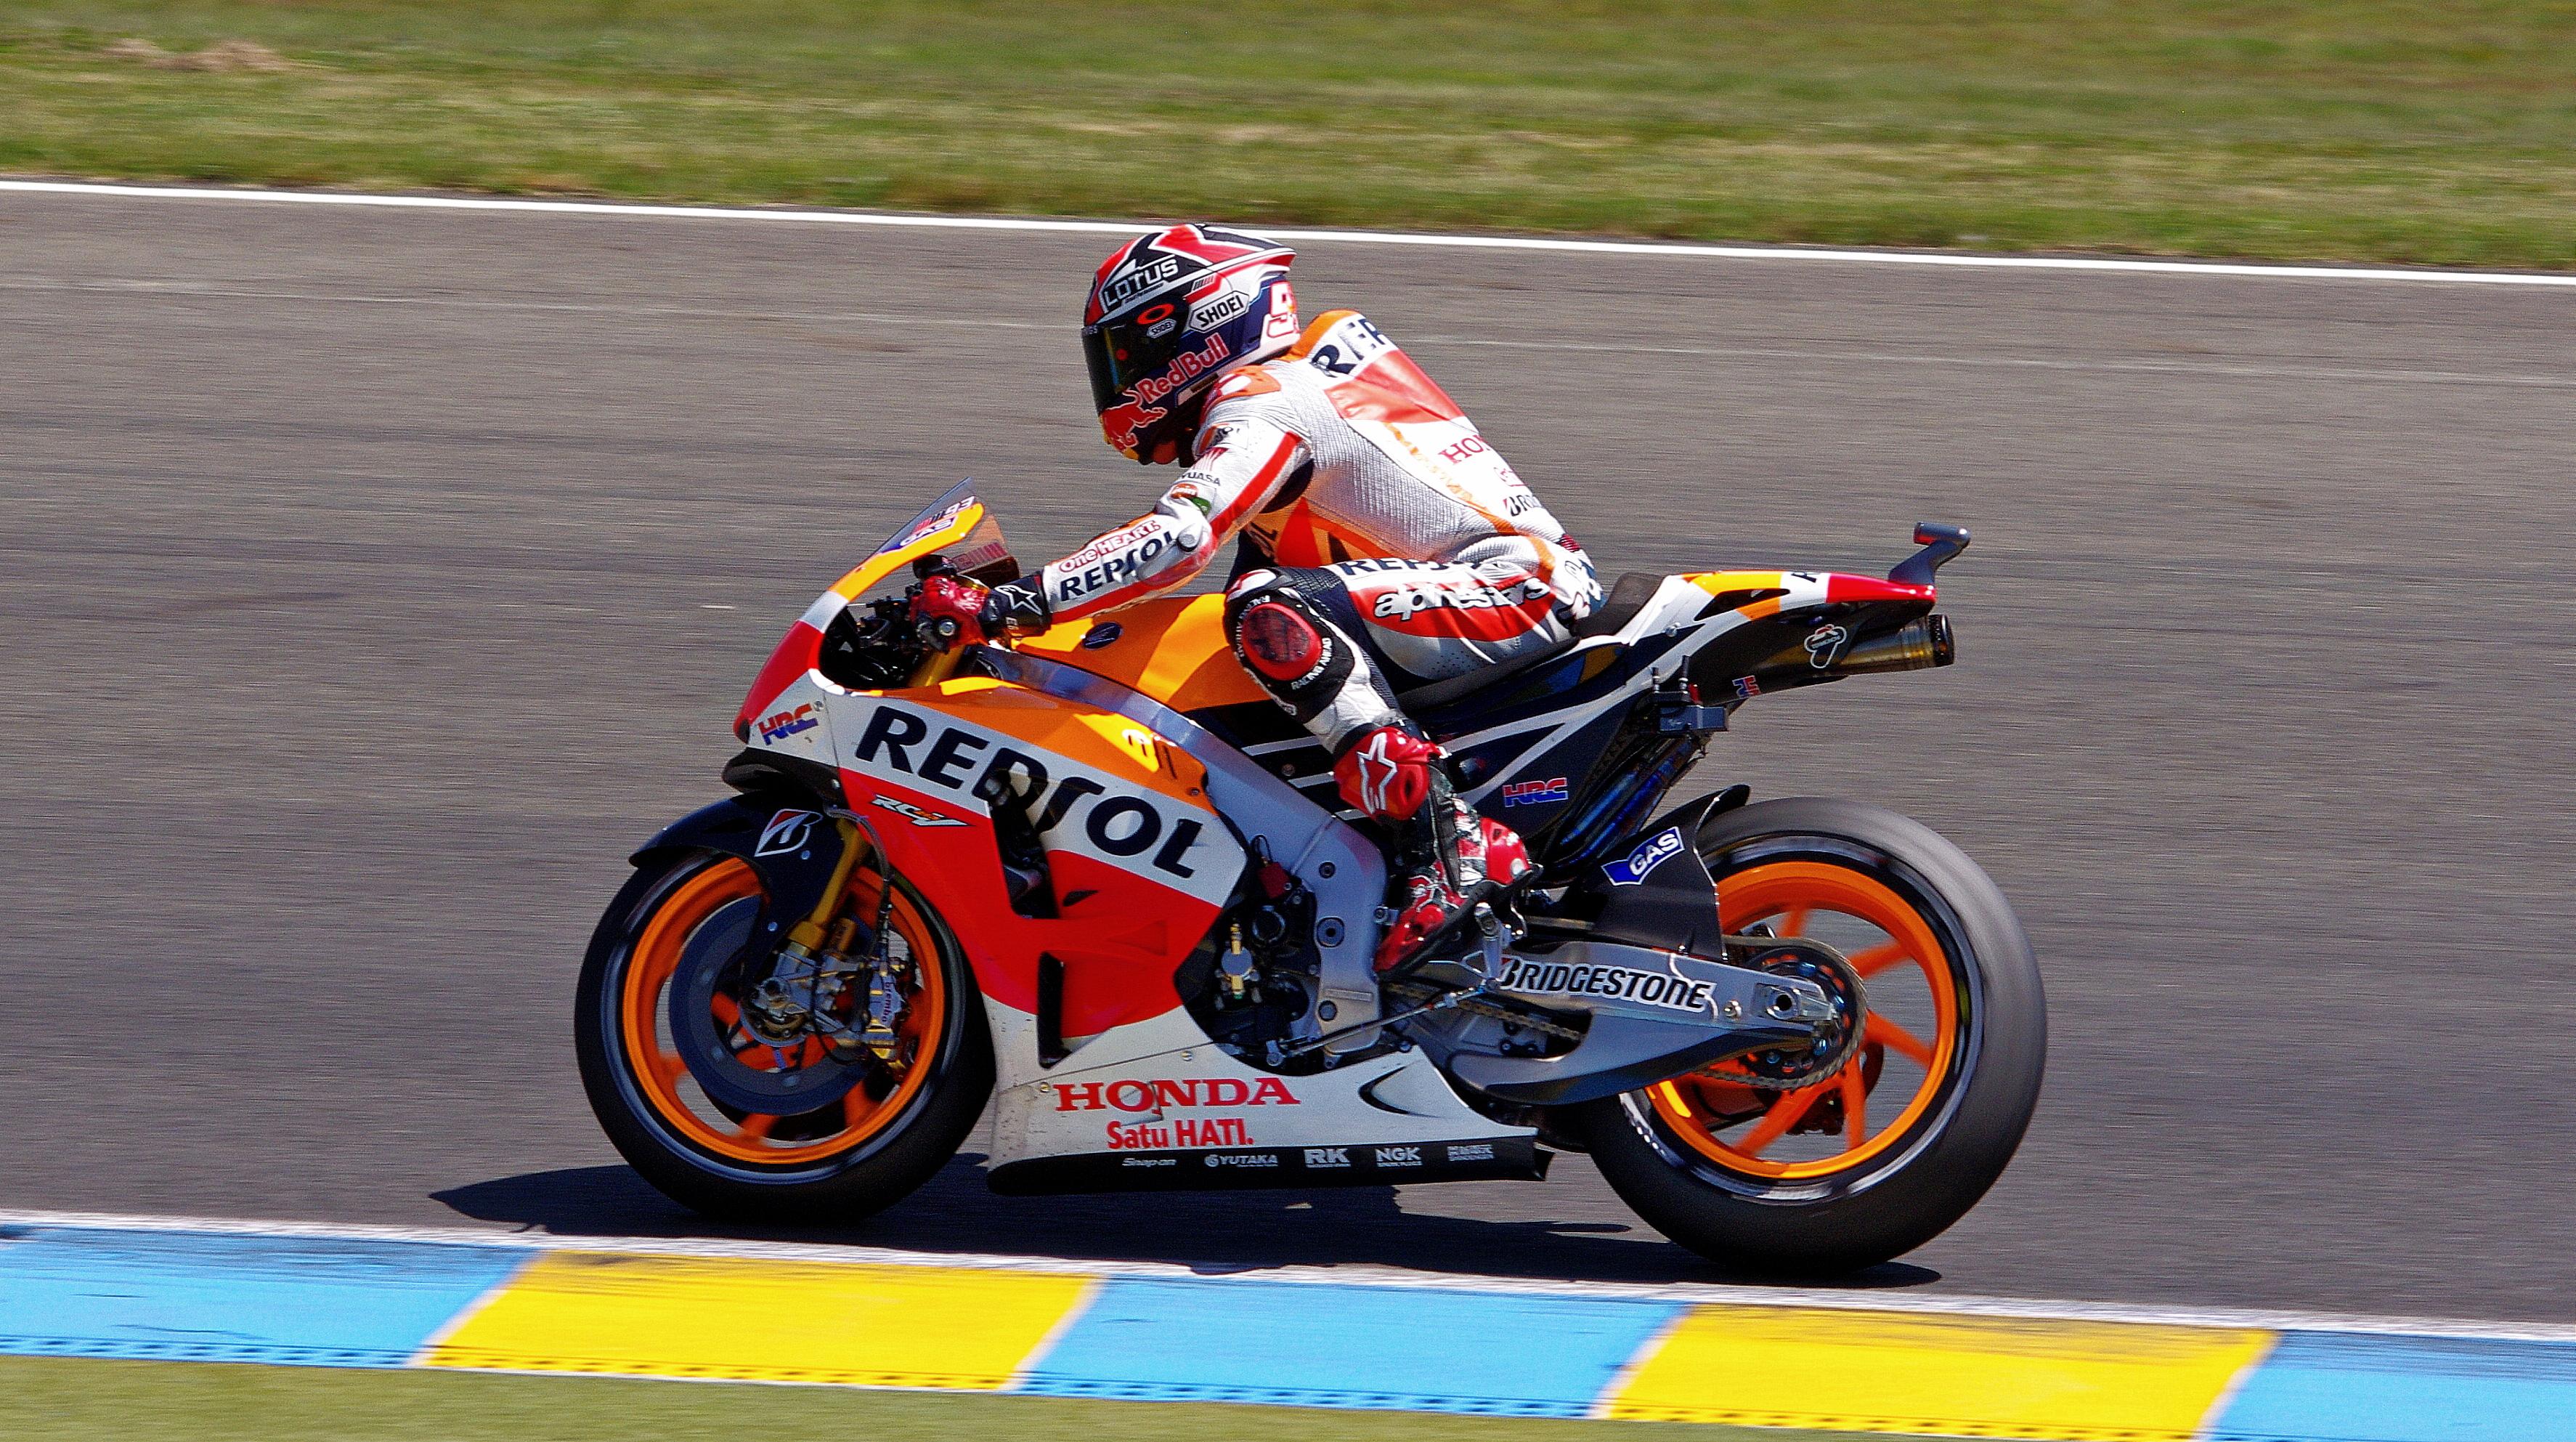 Honda Repsol Motogp | MotoGP 2017 Info, Video, Points Table